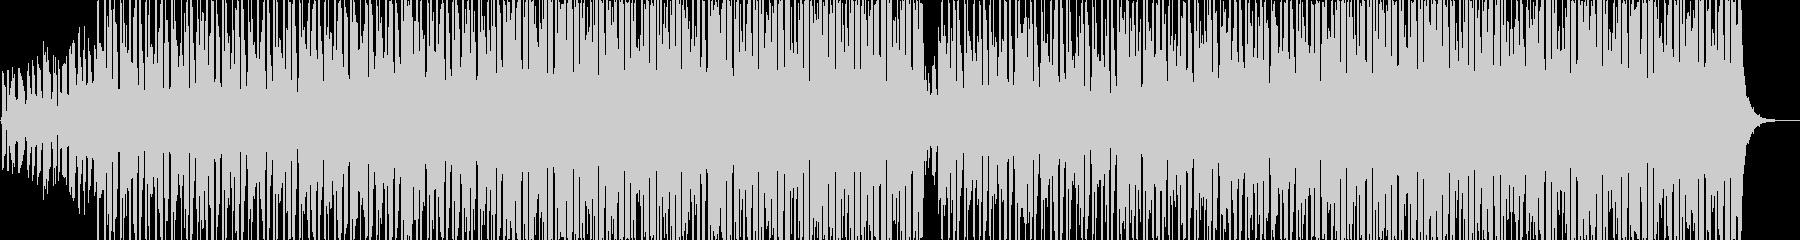 EDMショーリールフェス向けテックハウスの未再生の波形